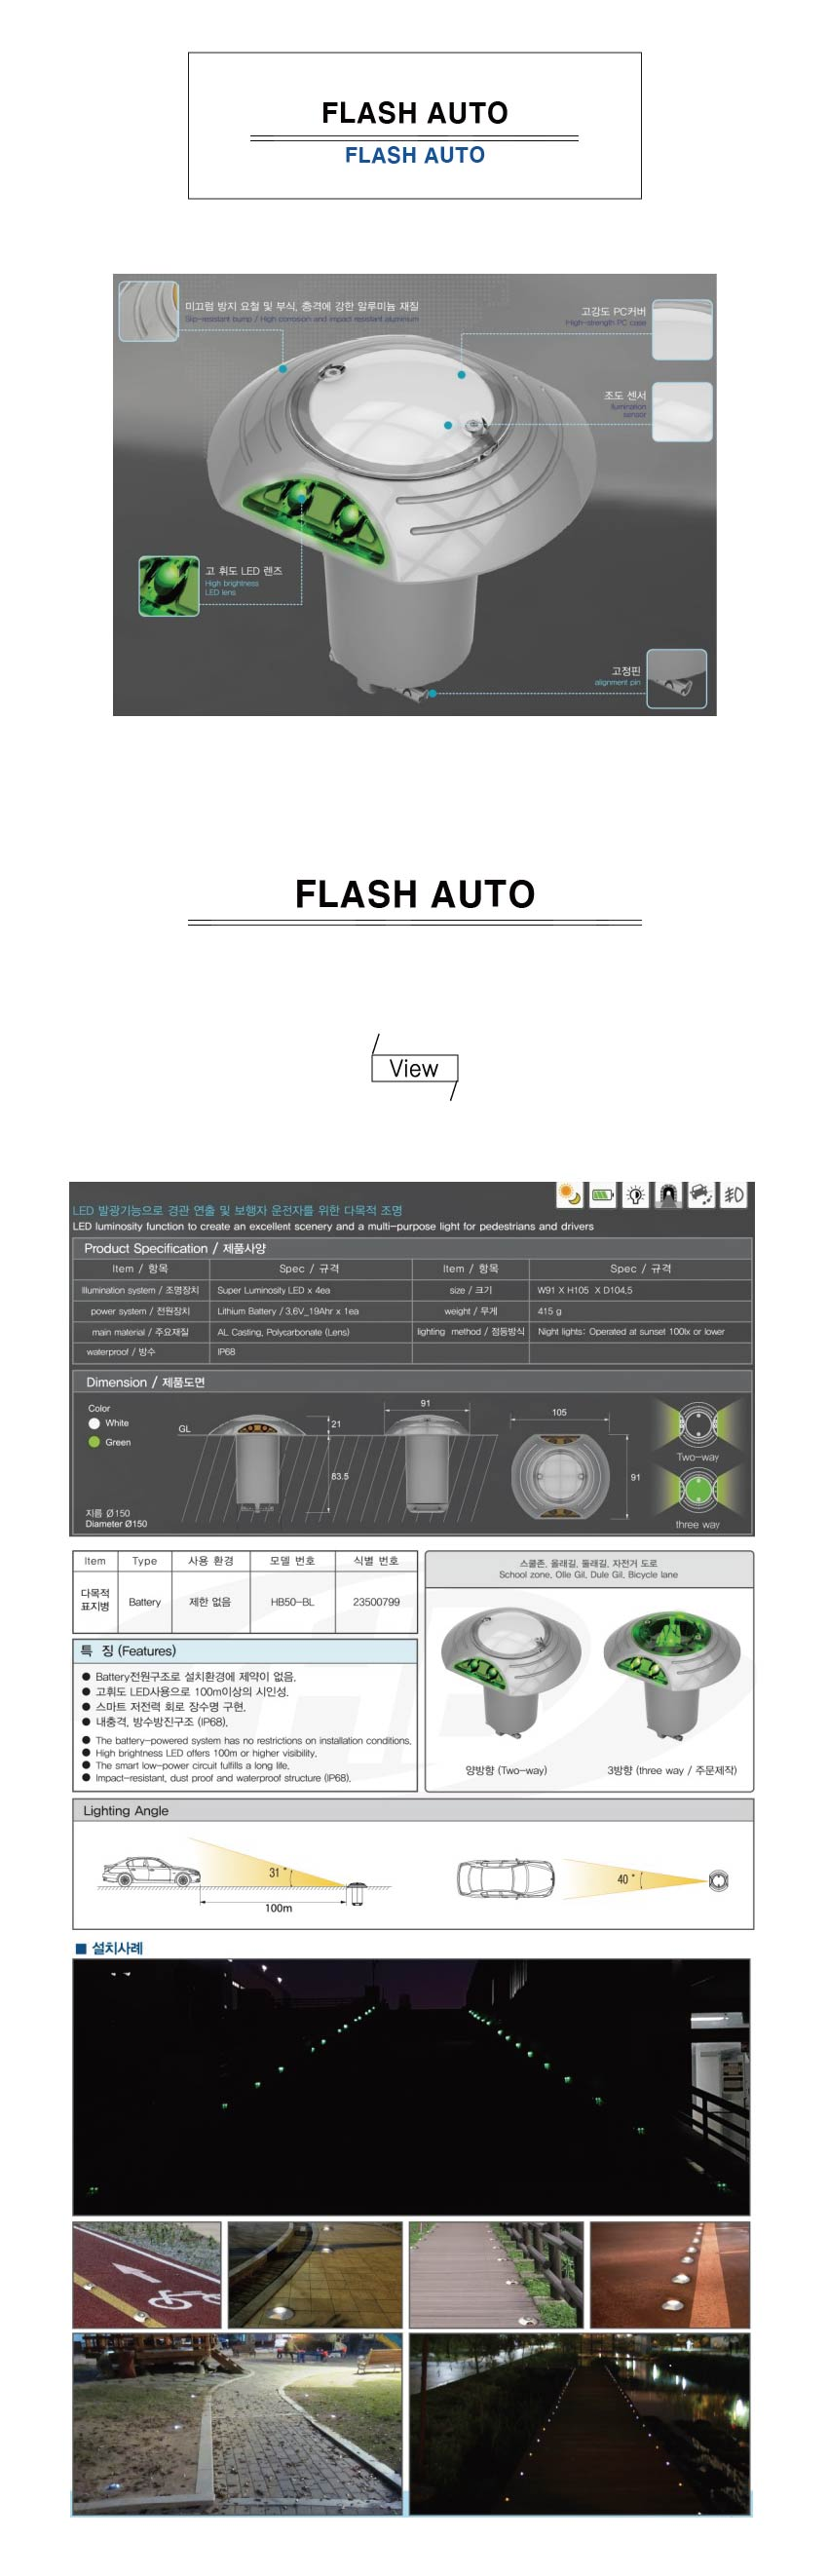 FLASH AUTO-1-01.jpg